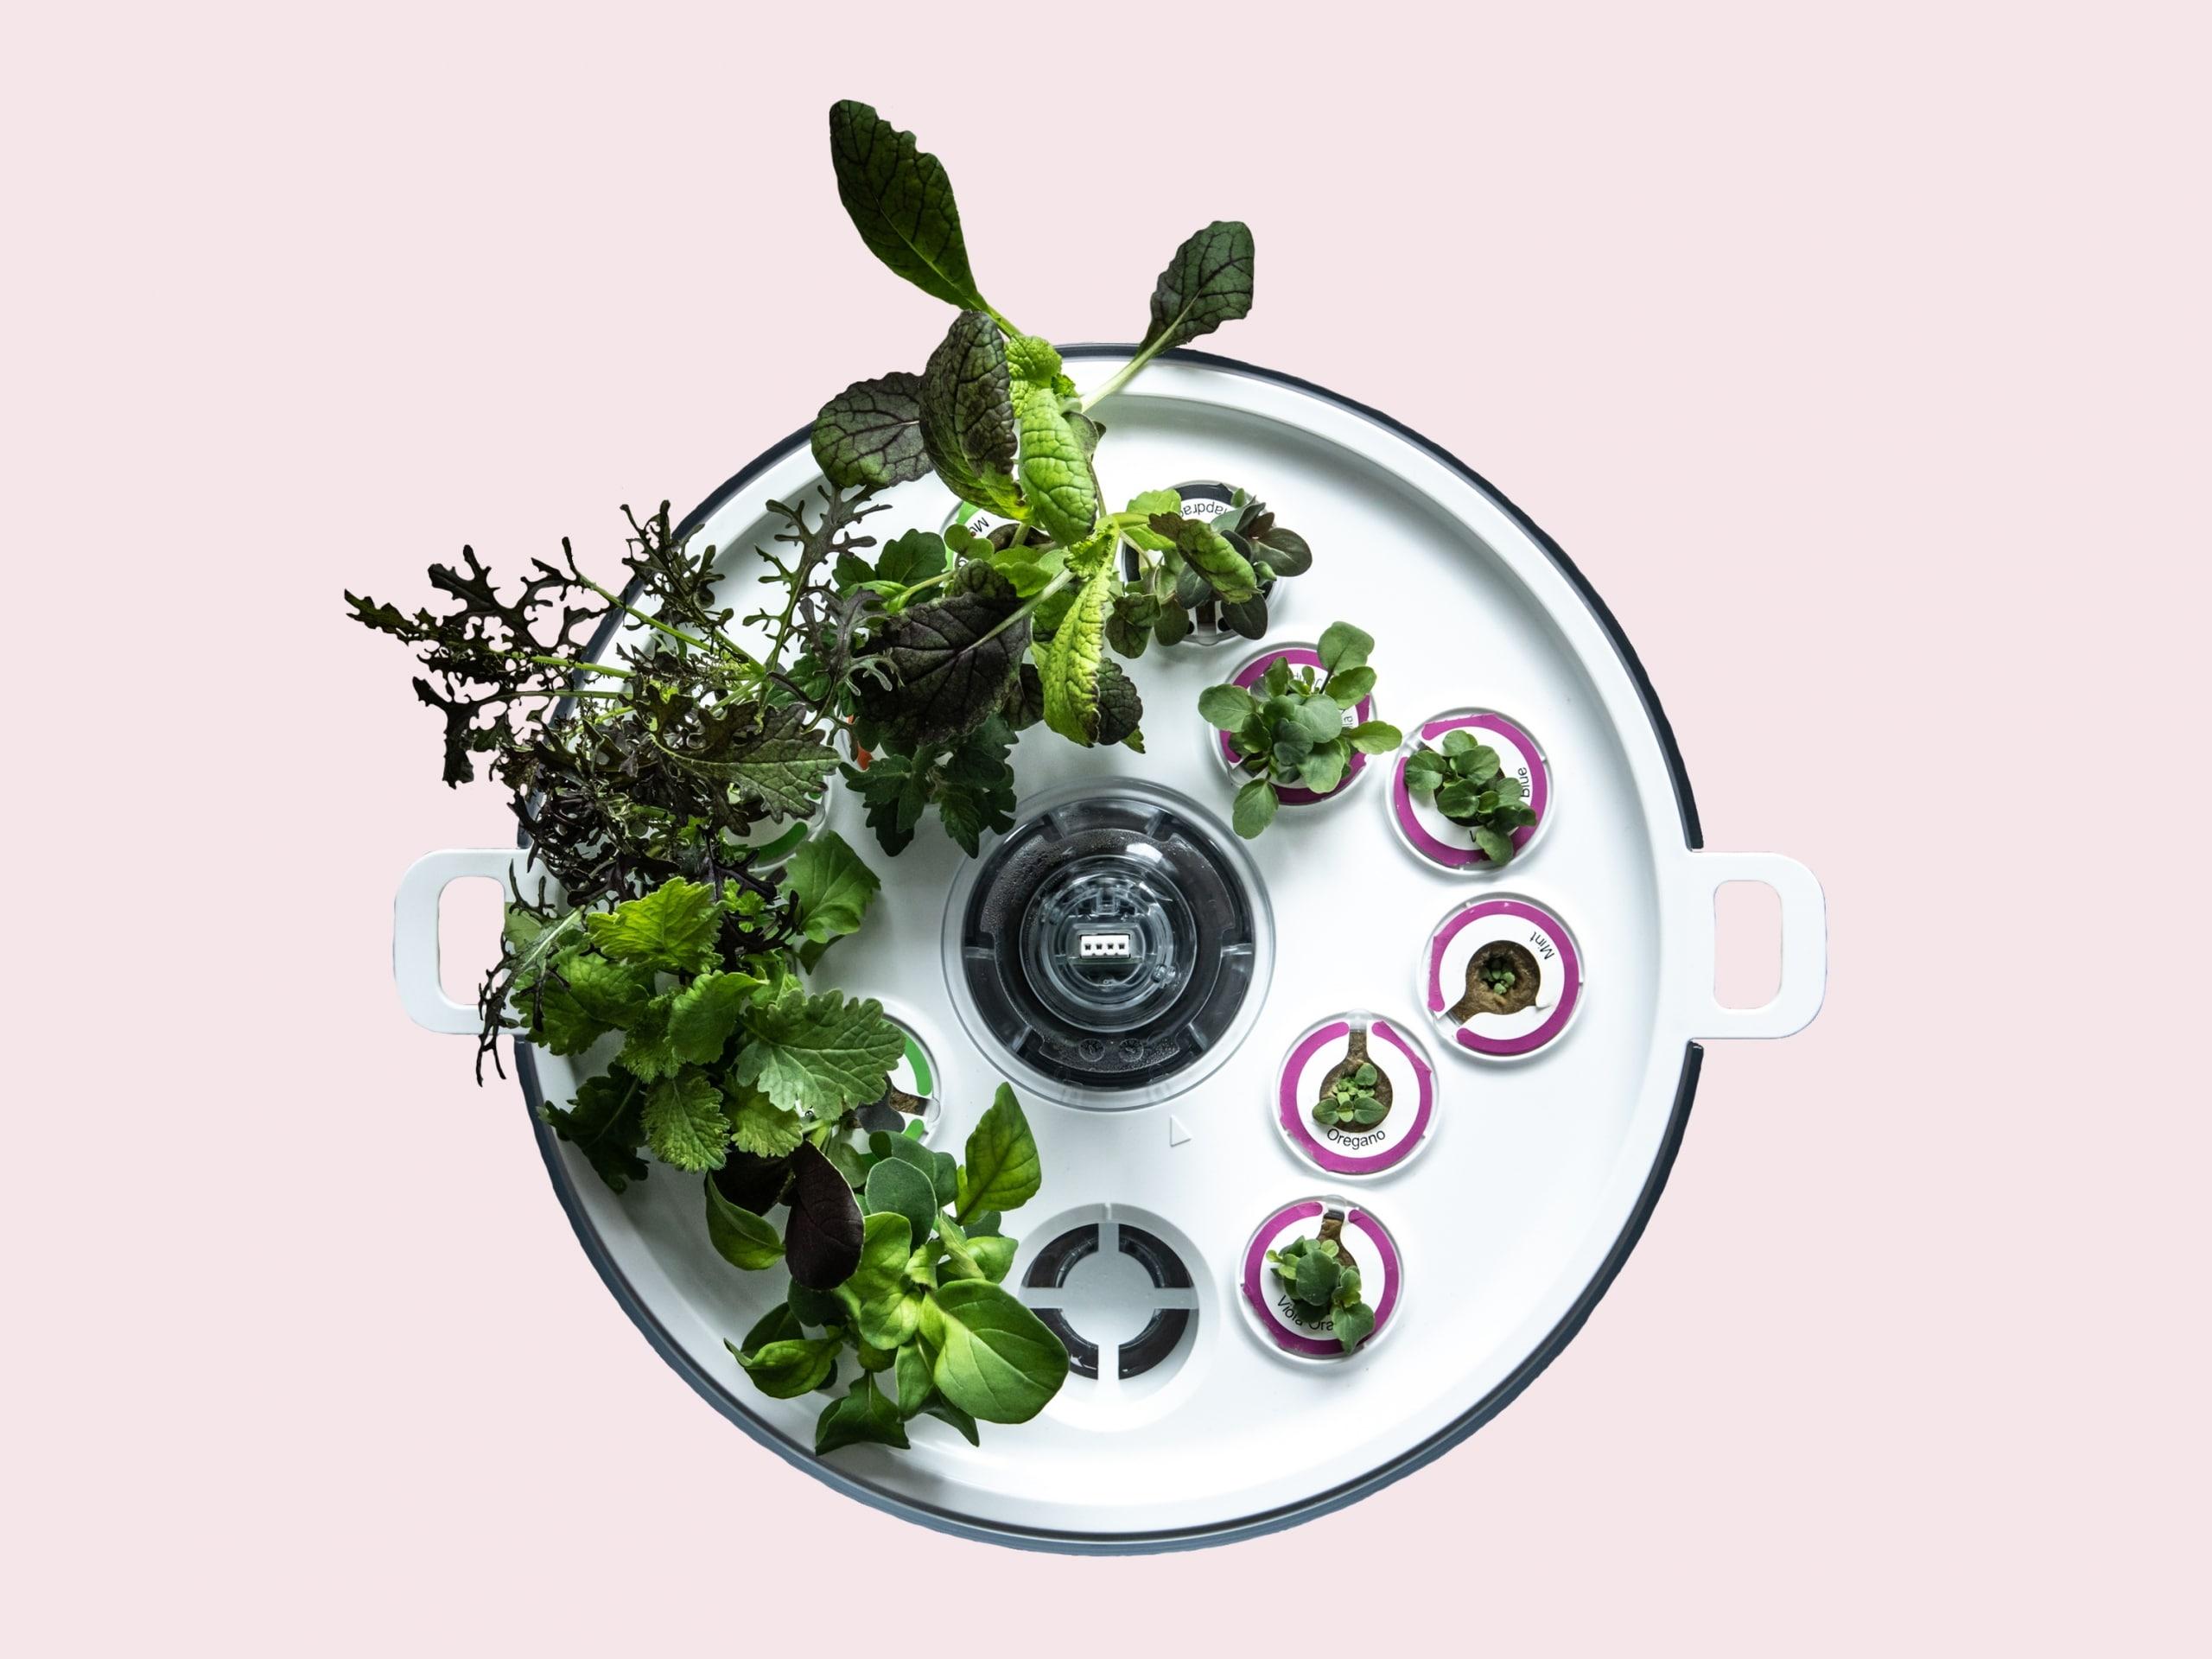 Plantui Smart Garden Titelbild scaled